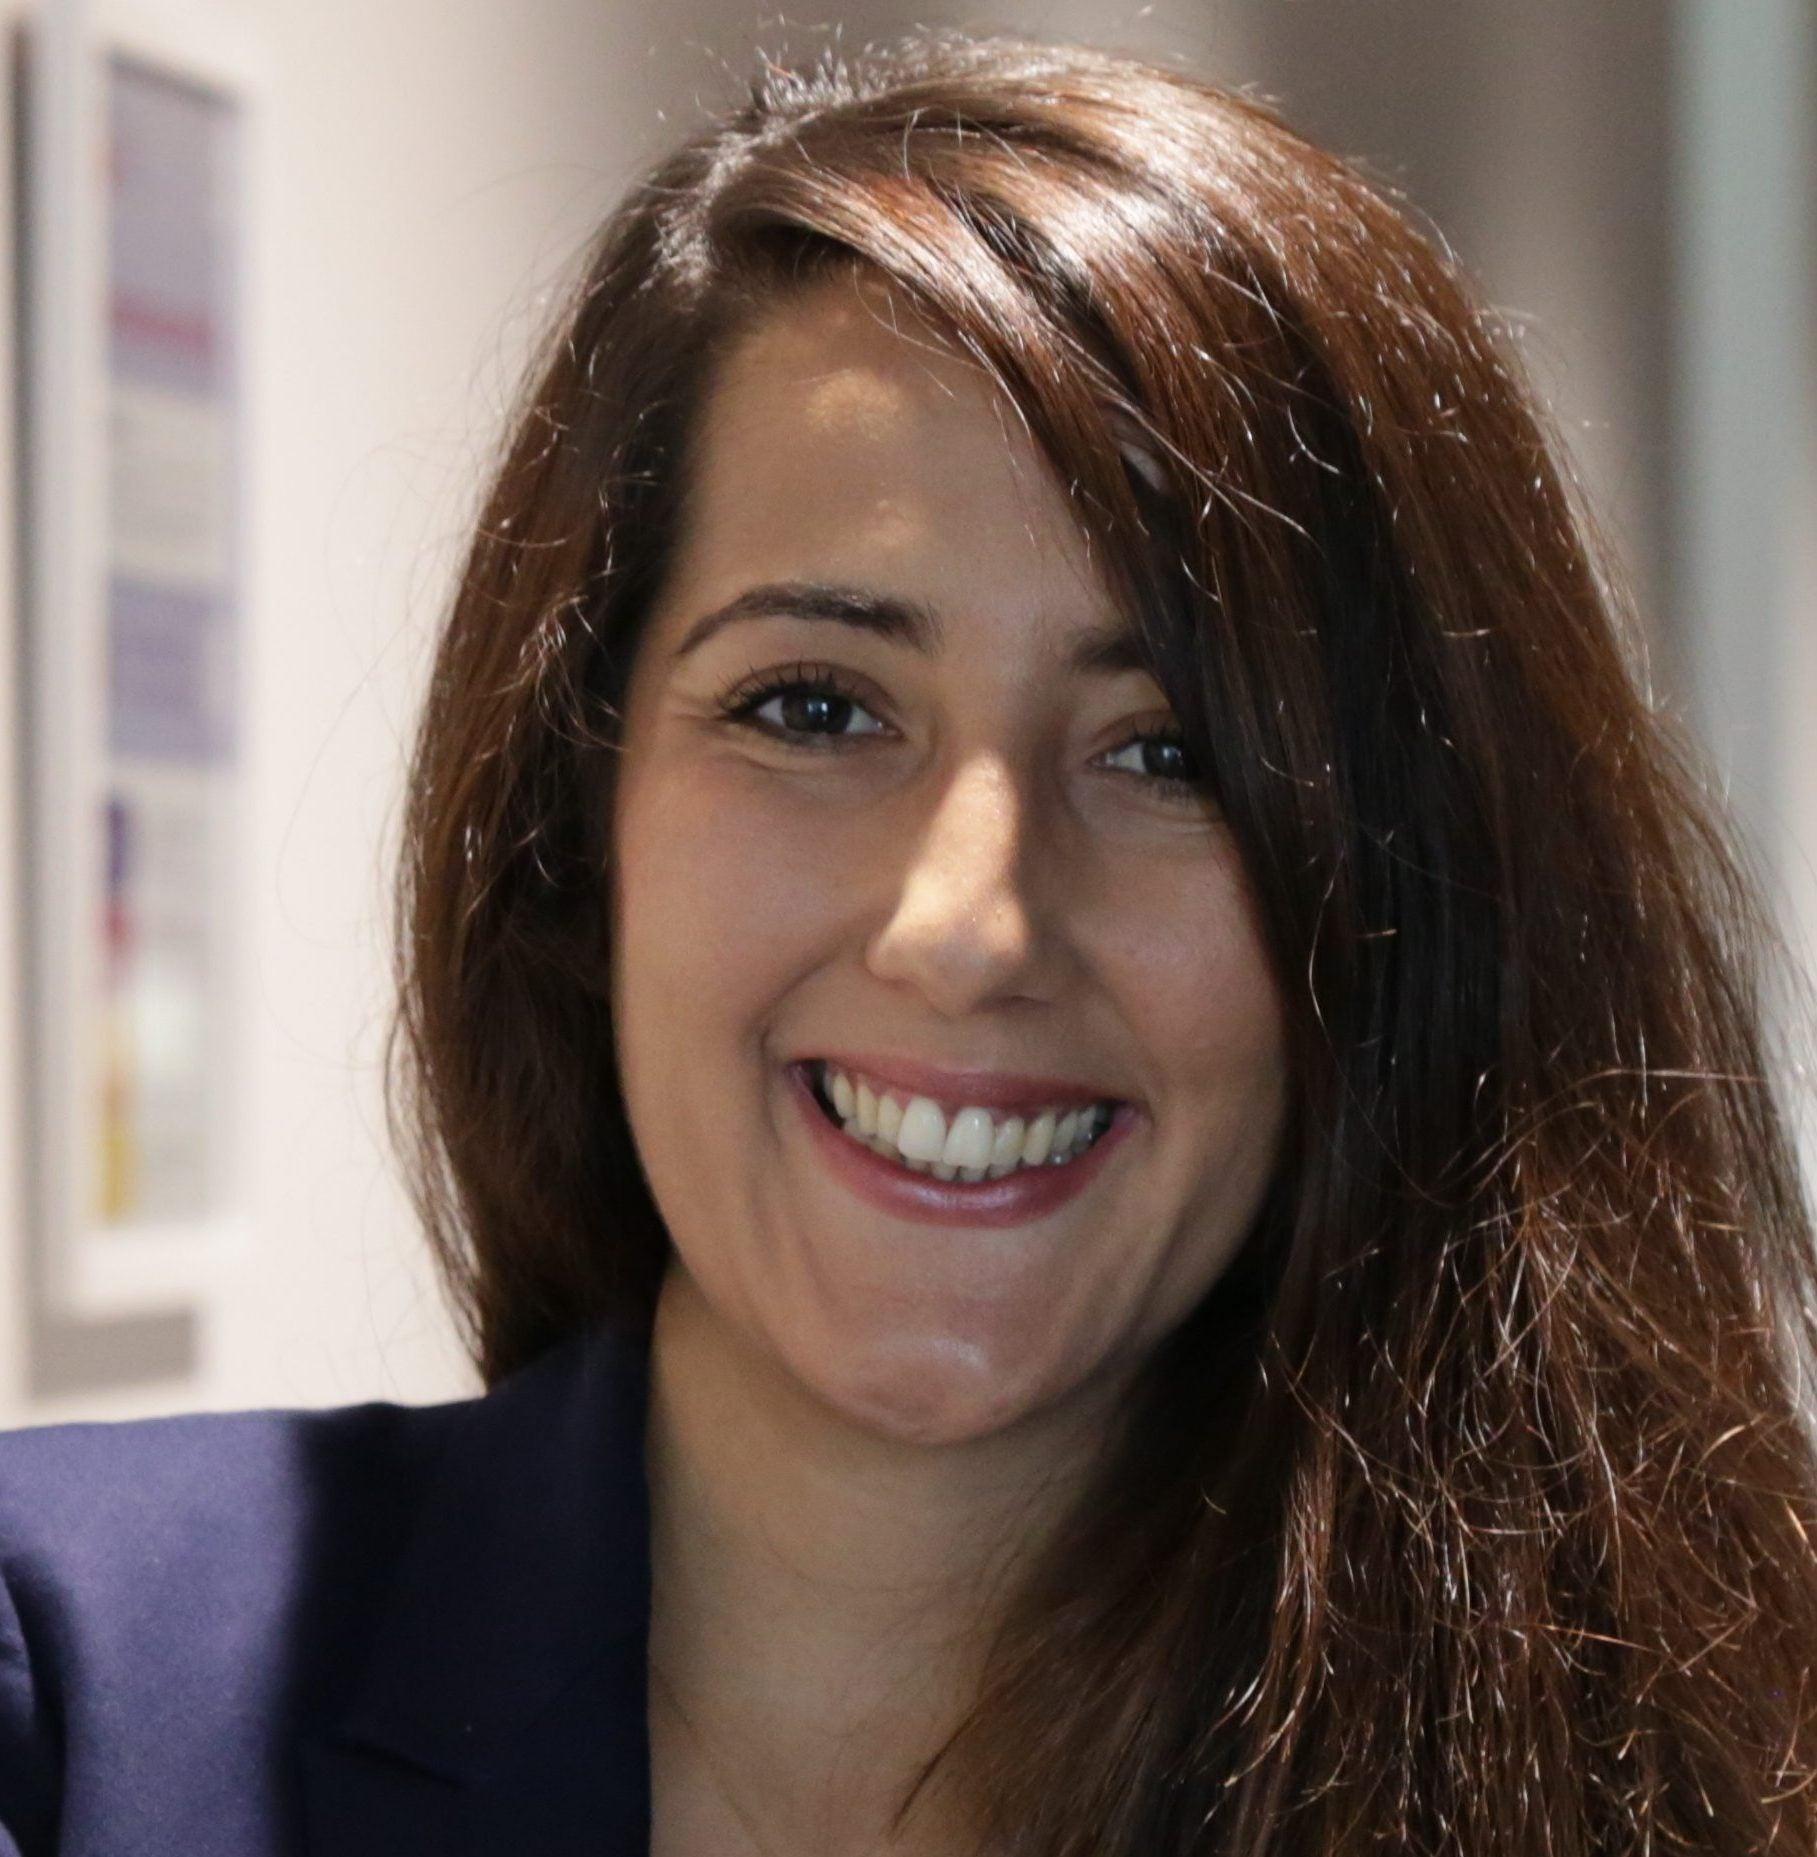 Melyssa Haffaf